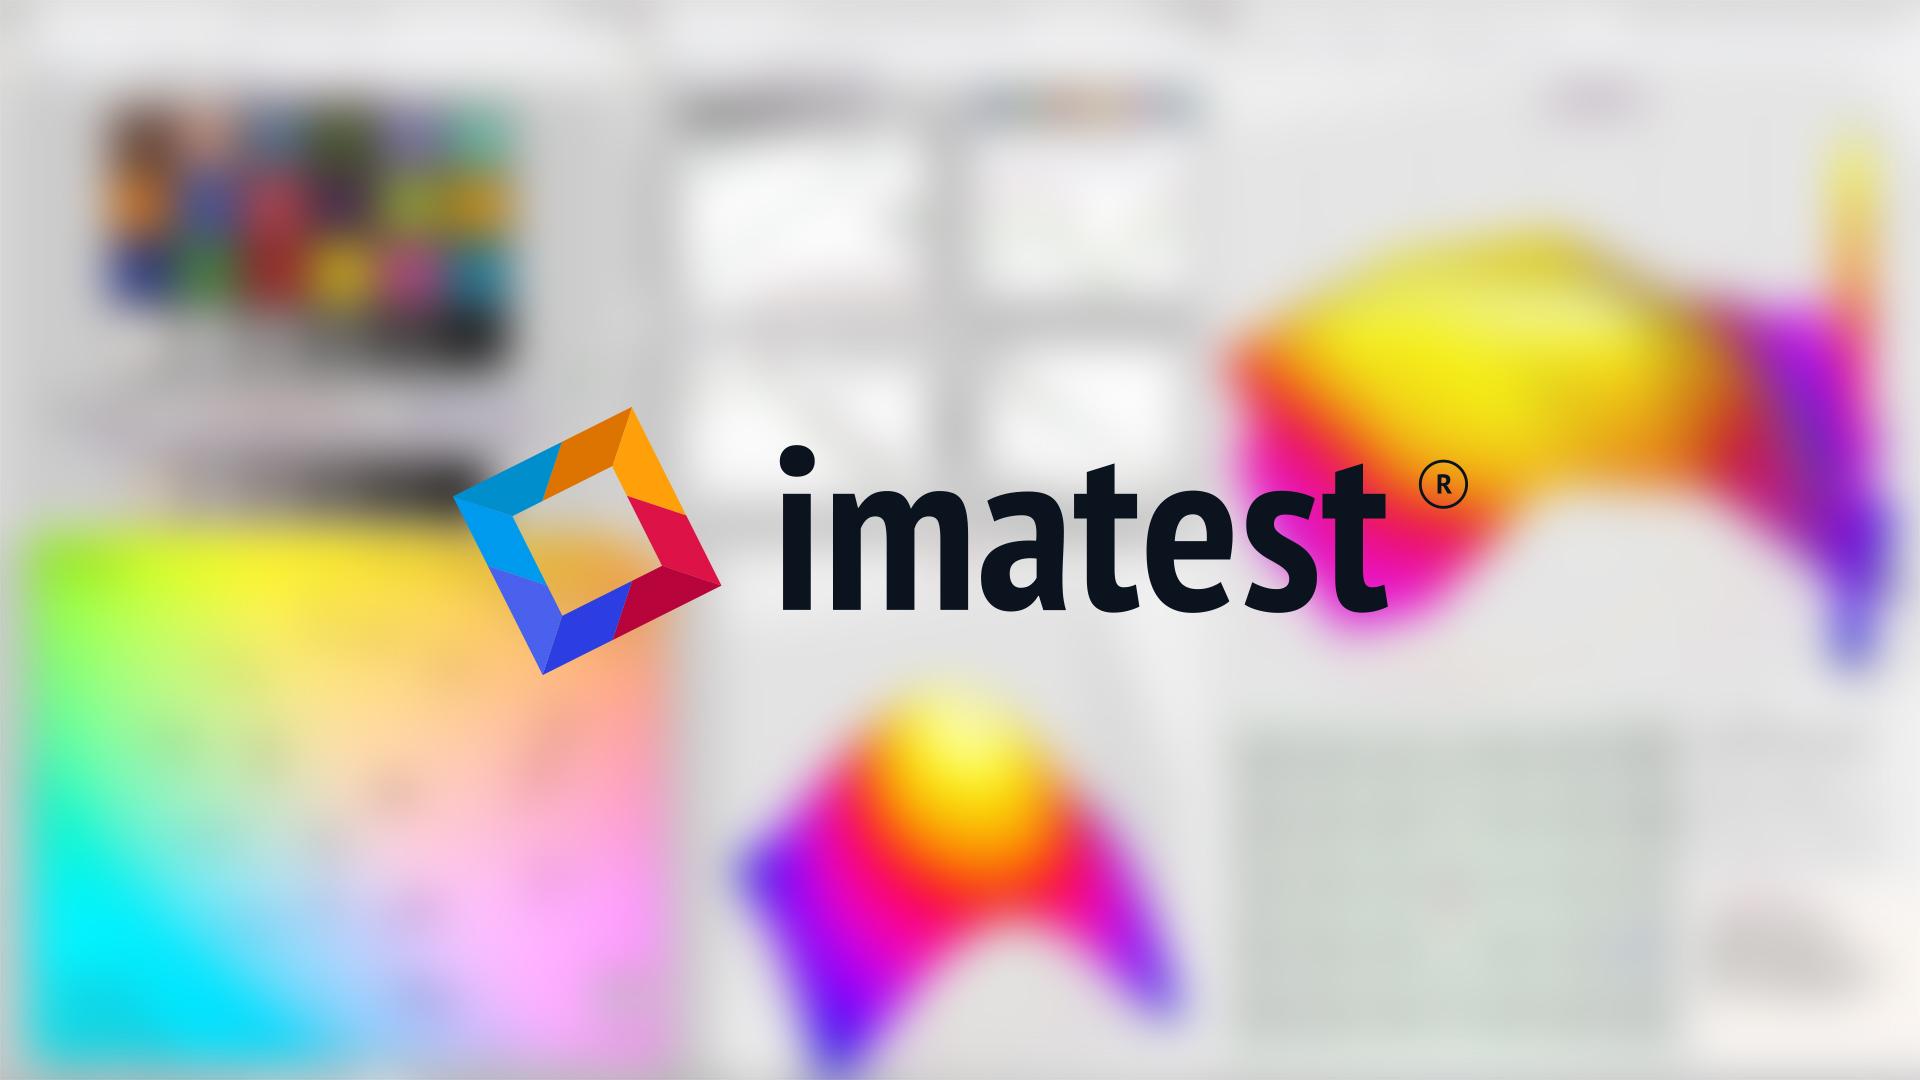 Imatest Lighting Control